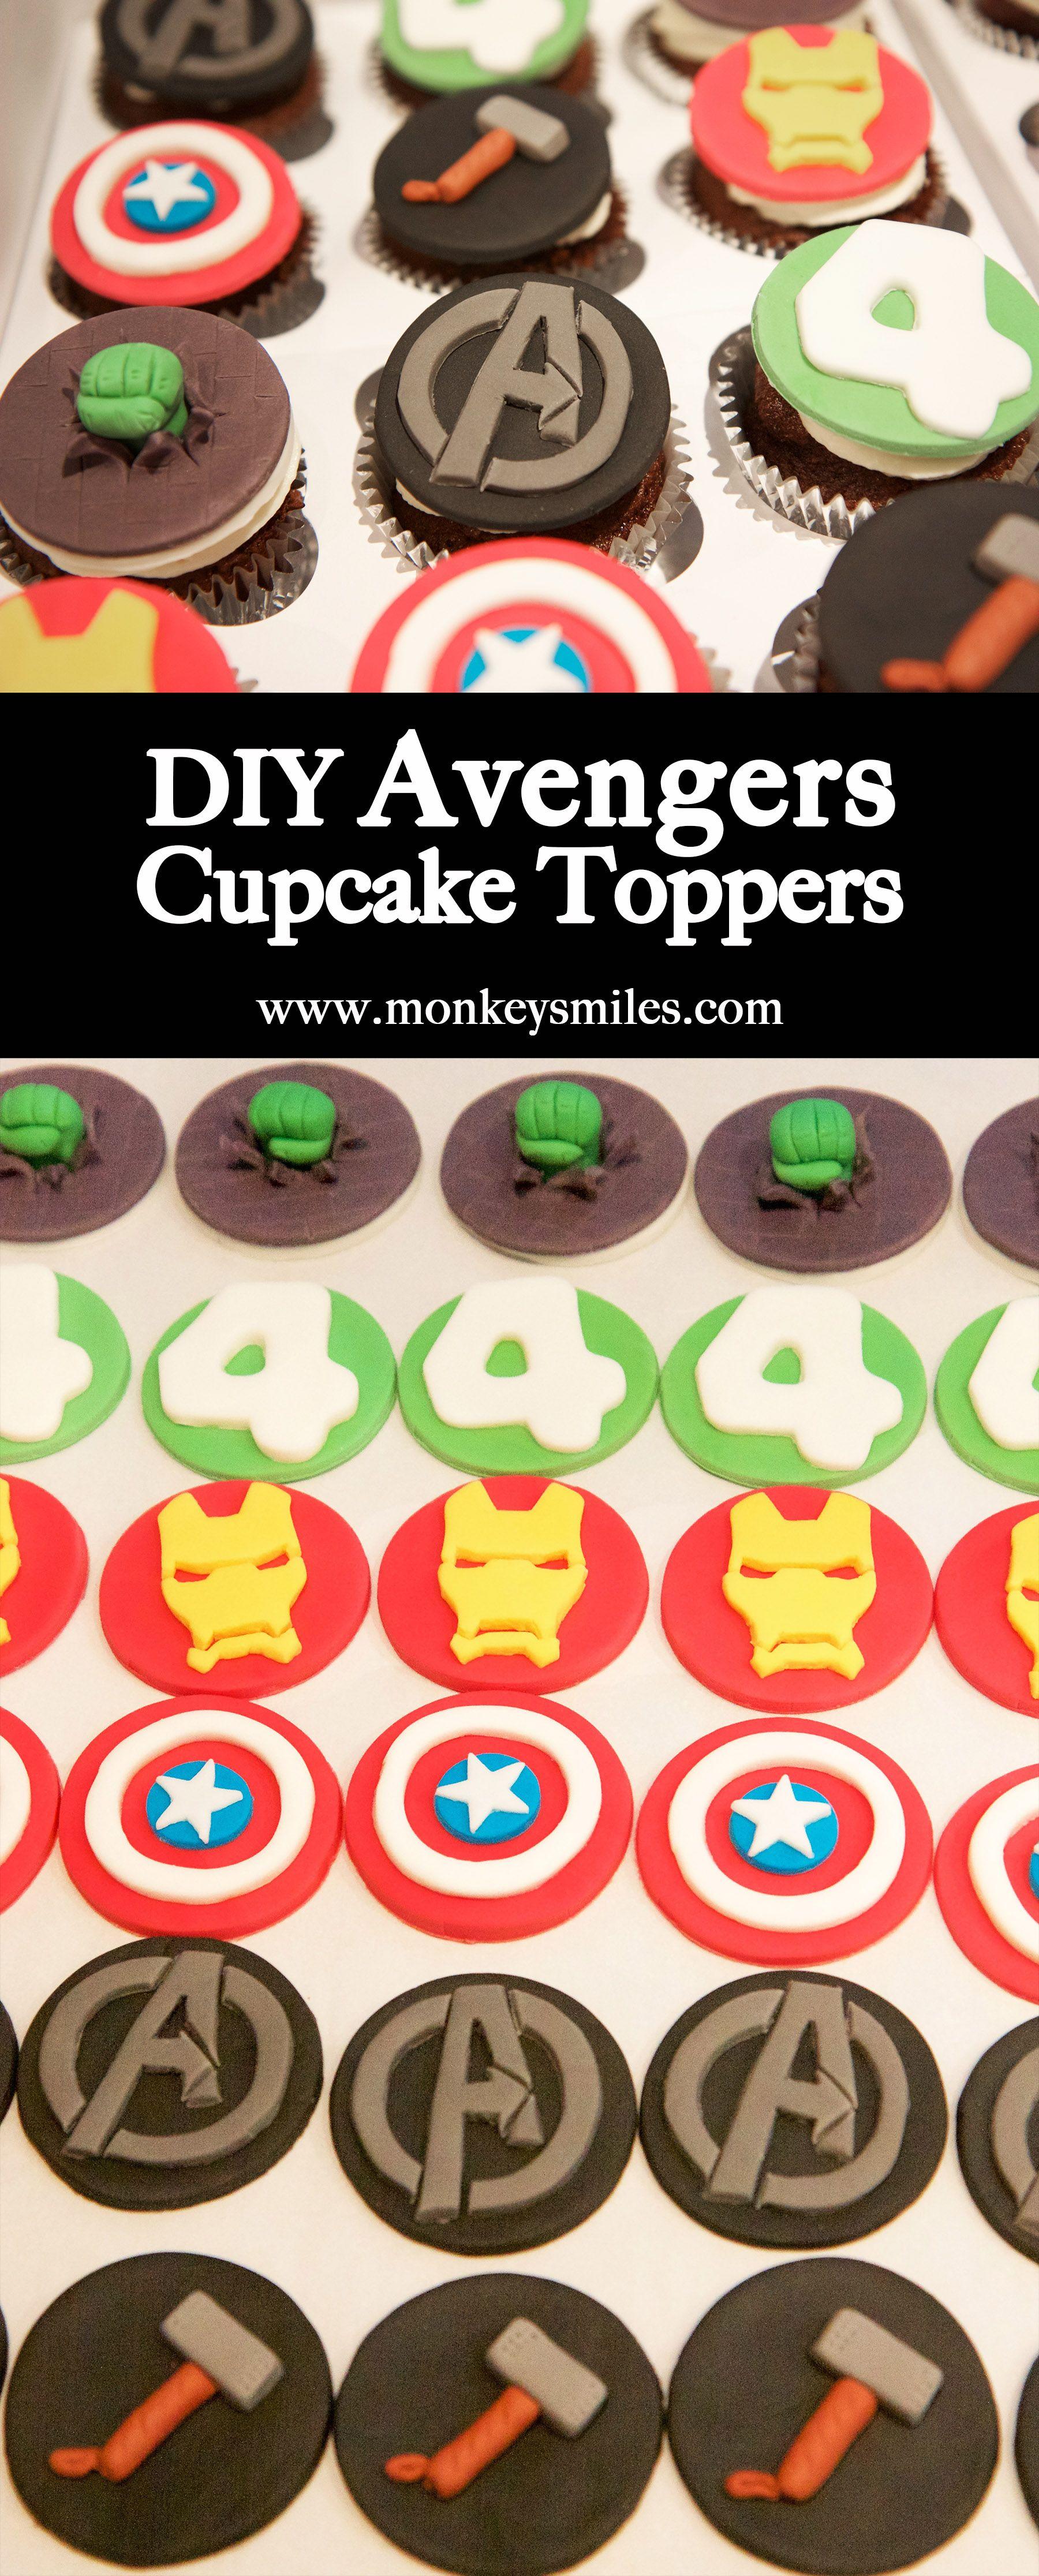 Marvelous Diy Avengers Birthday Cupcake Toppers Avengers Birthday Cakes Funny Birthday Cards Online Unhofree Goldxyz